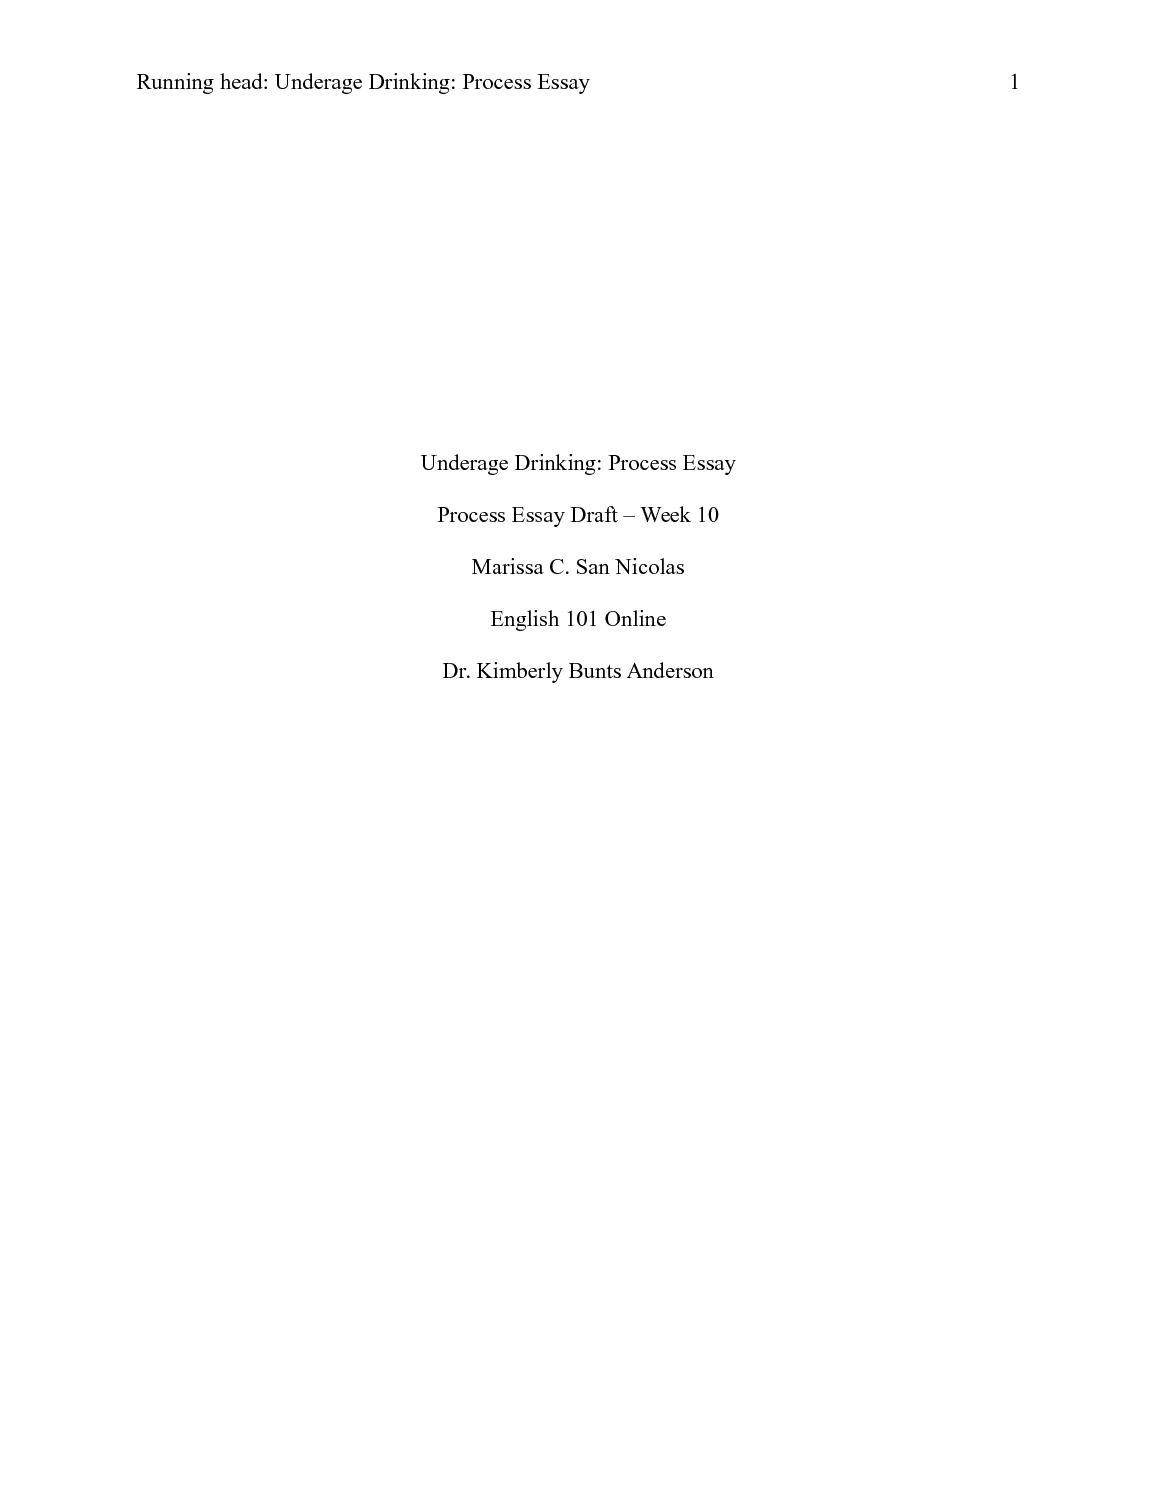 Example English Essay  Marijuana Should Be Illegal Essay also Persuasive Essay On Animal Cruelty Calamo  Process Essay Draft  Extended Essay Abstract Example